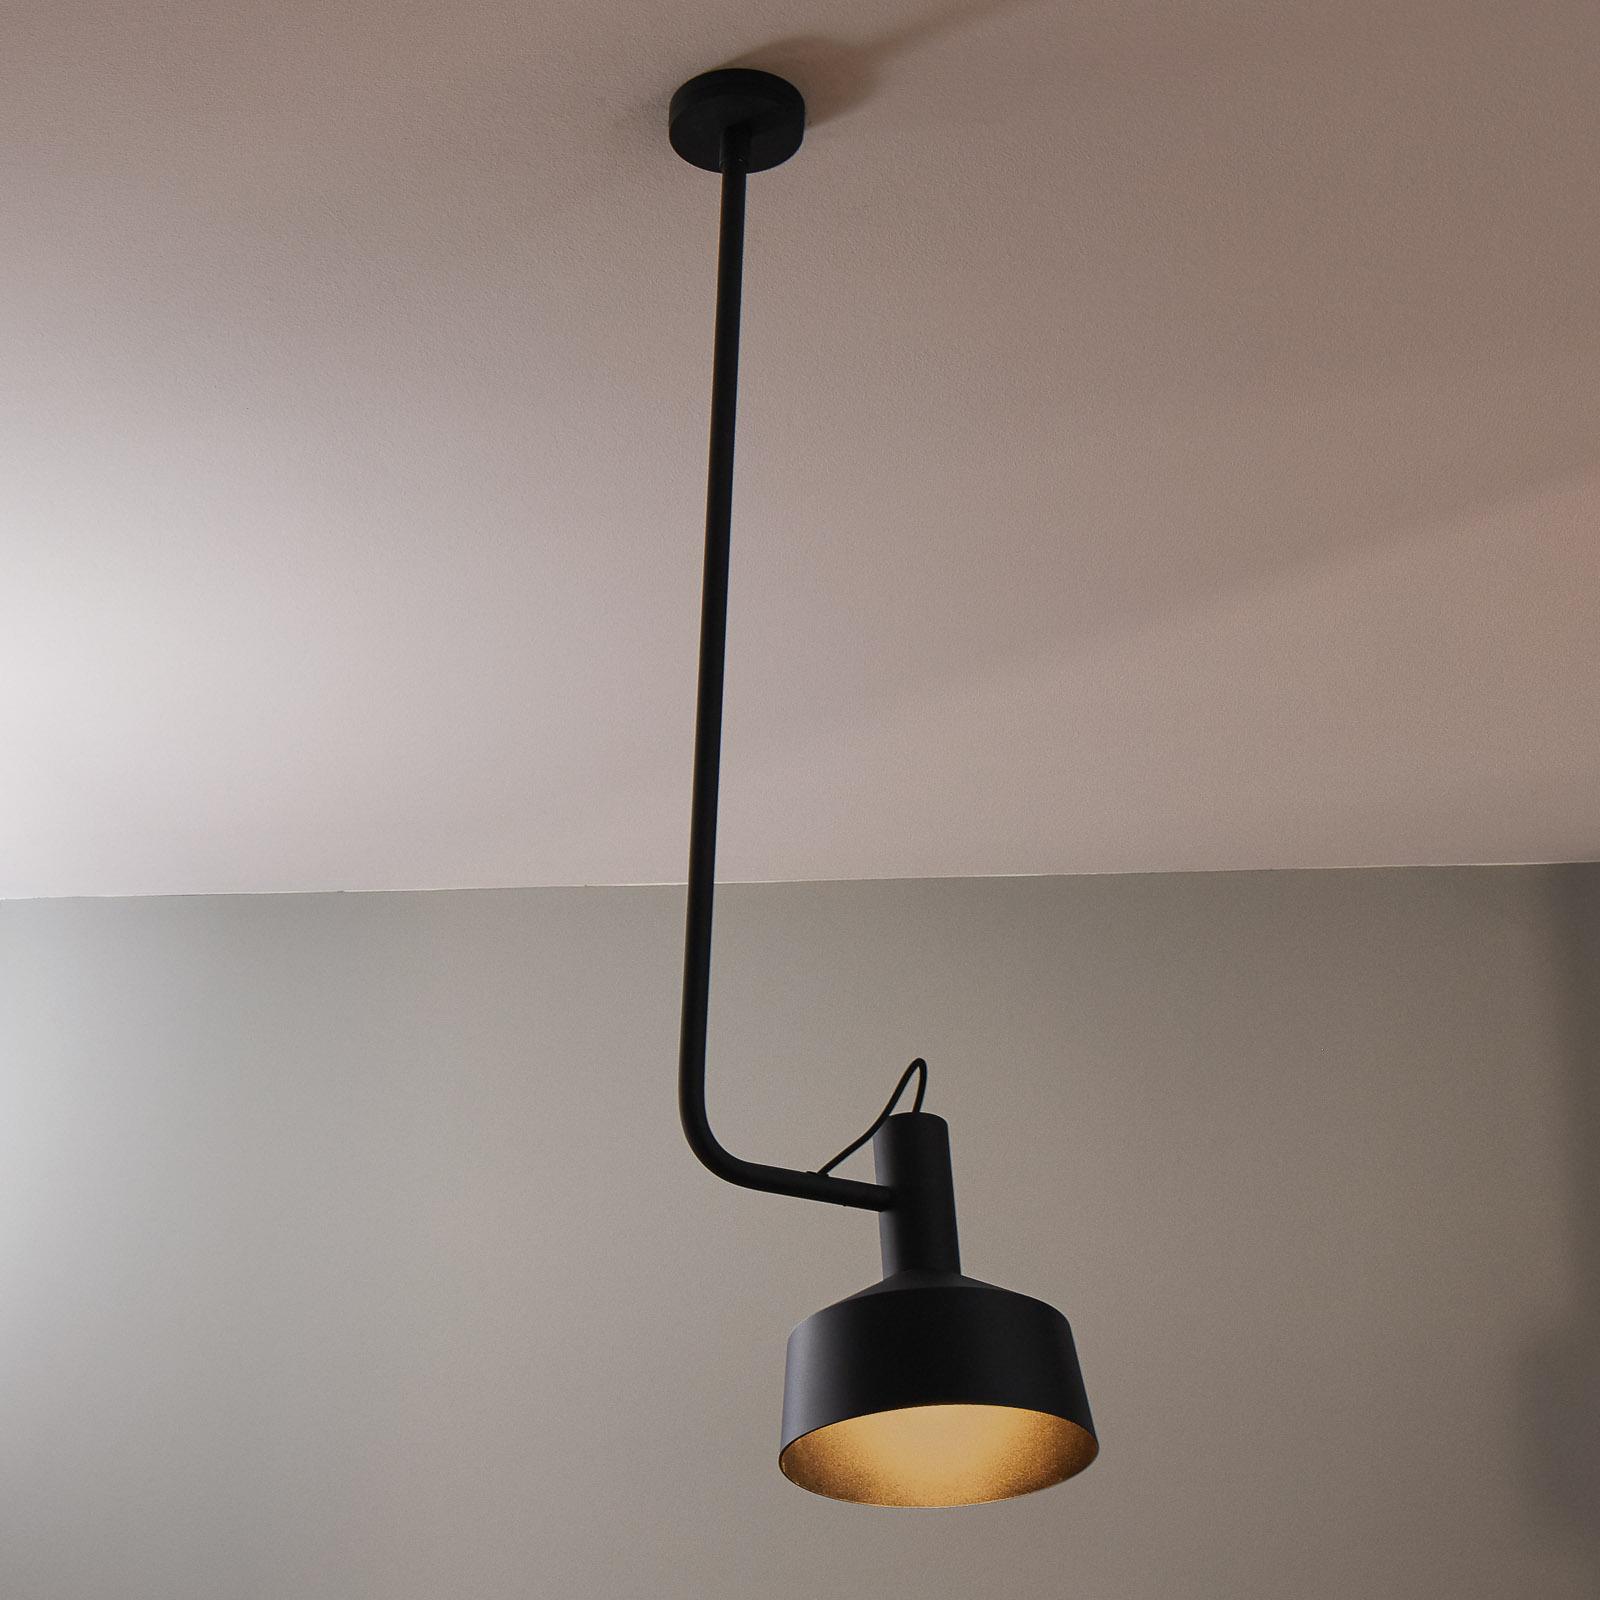 WEVER & DUCRÉ Roomor Hänge GU10 1fl. 25cm schwarz